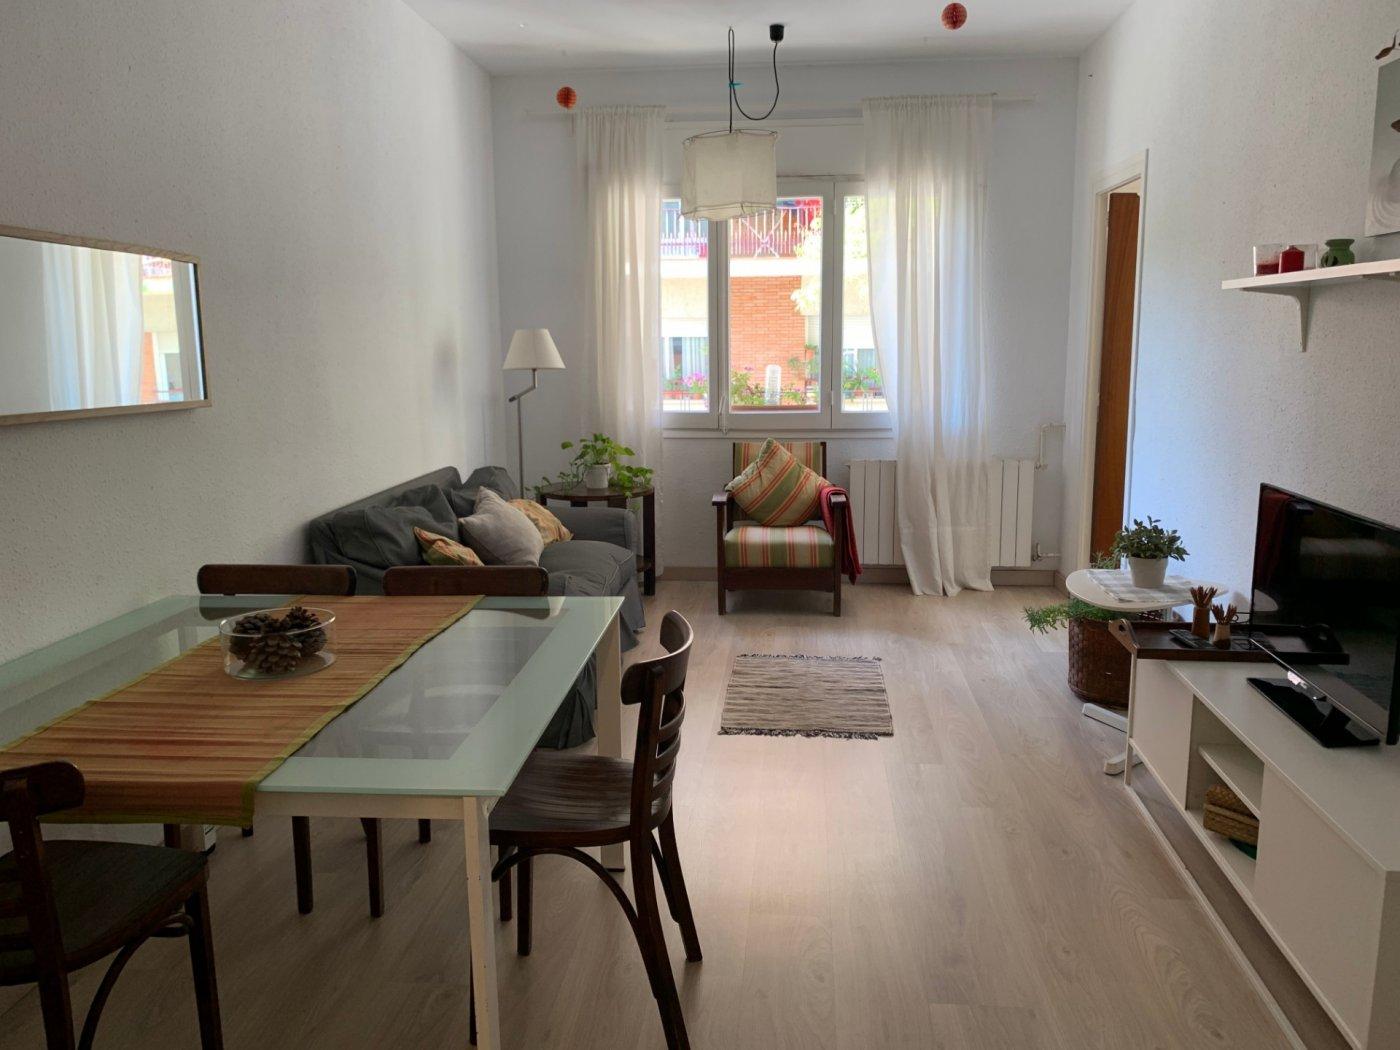 Flat for rent in El Baix Guinardo, Barcelona